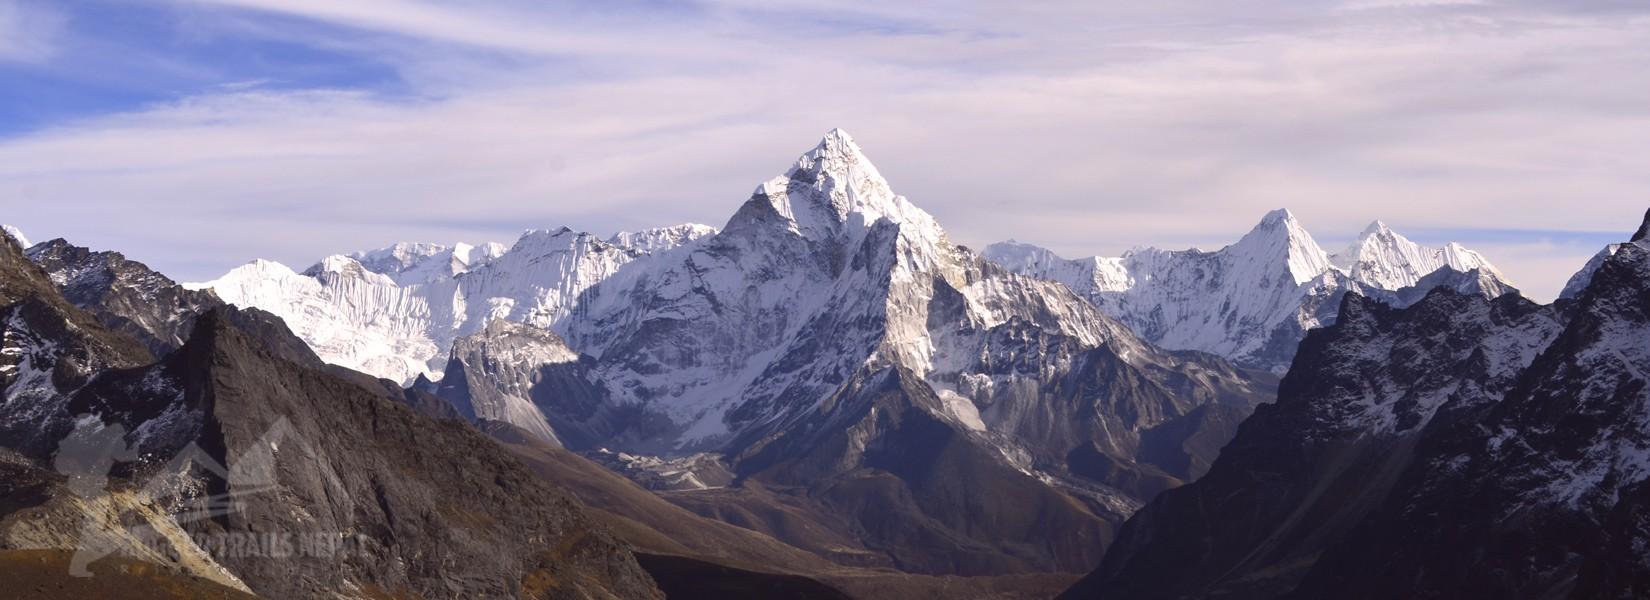 rugged trails nepal best selling treks